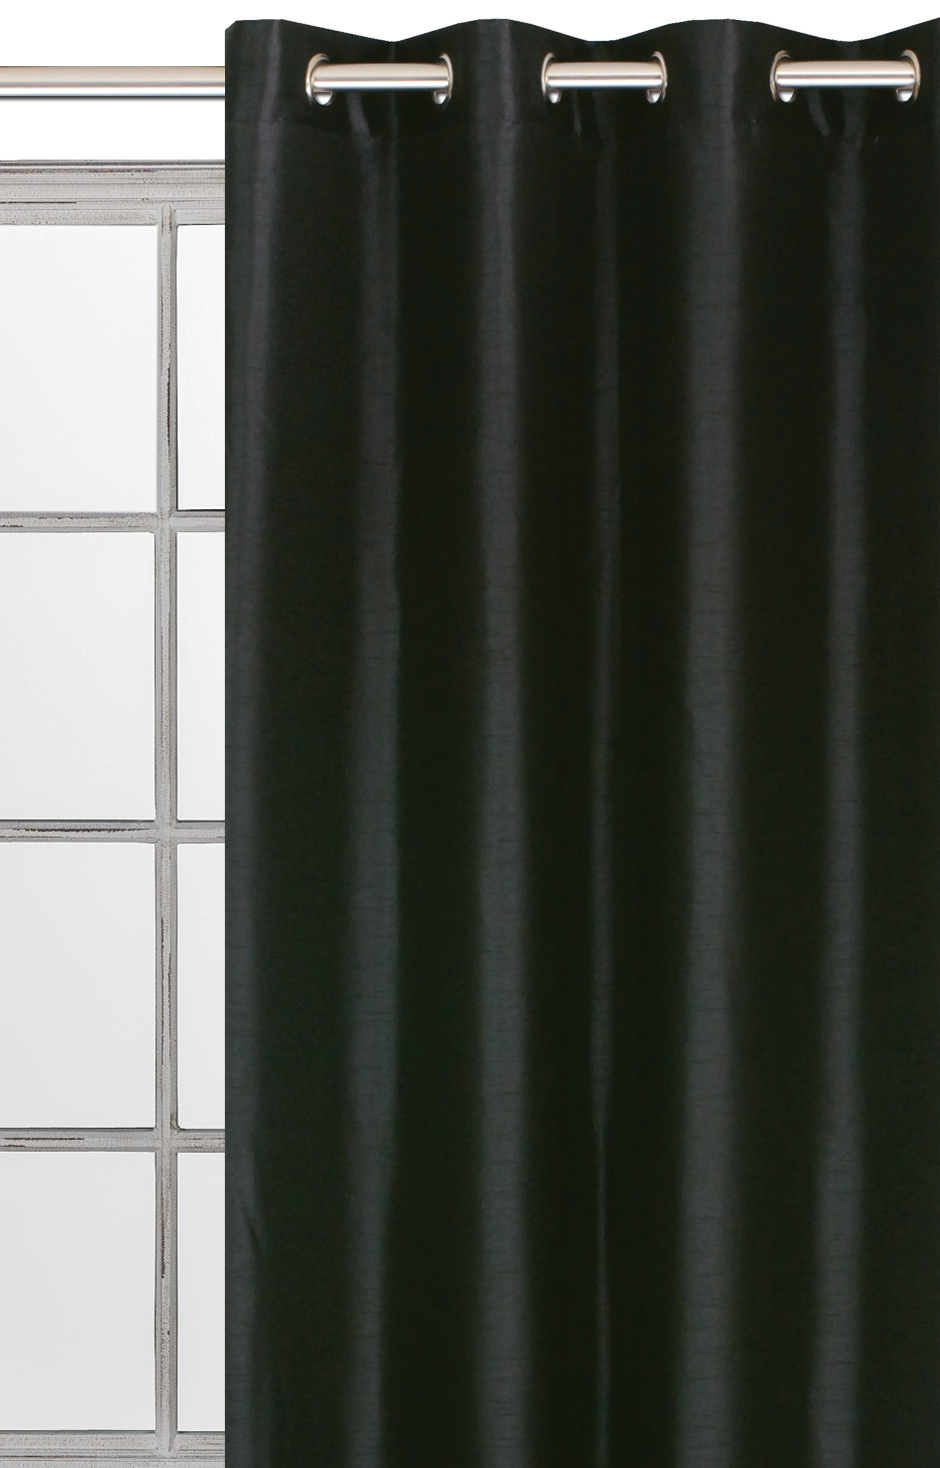 BALLERINA Noir / Black